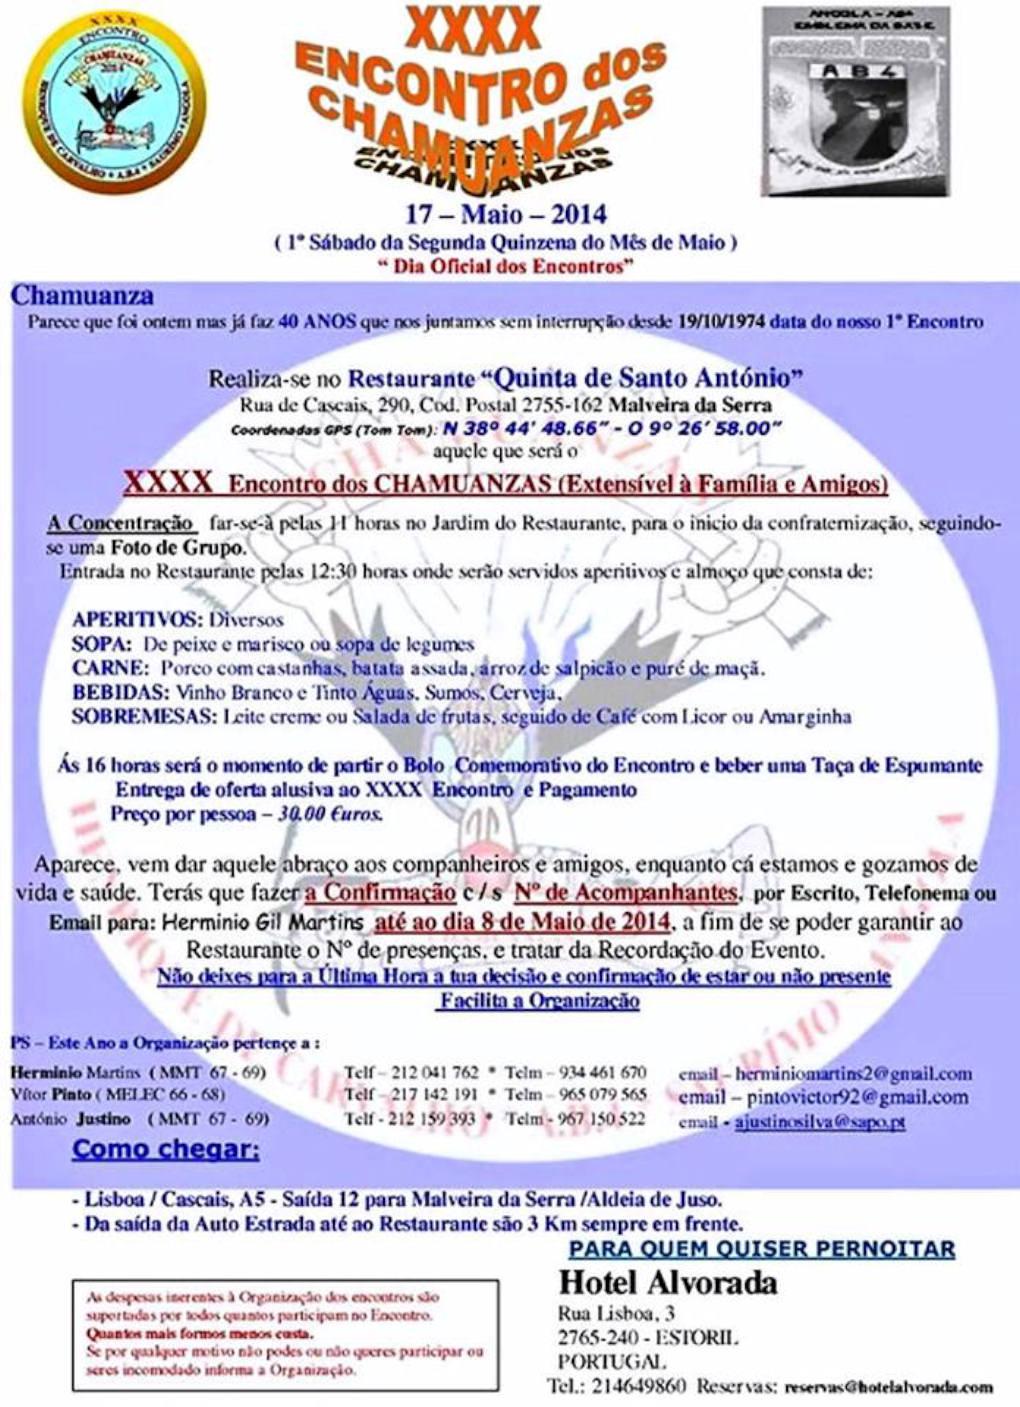 XXXX Encontro dos Chamuanzas - Aeródromo Base 4 - Malveira da Serra - 17Mai2014 Chamua10